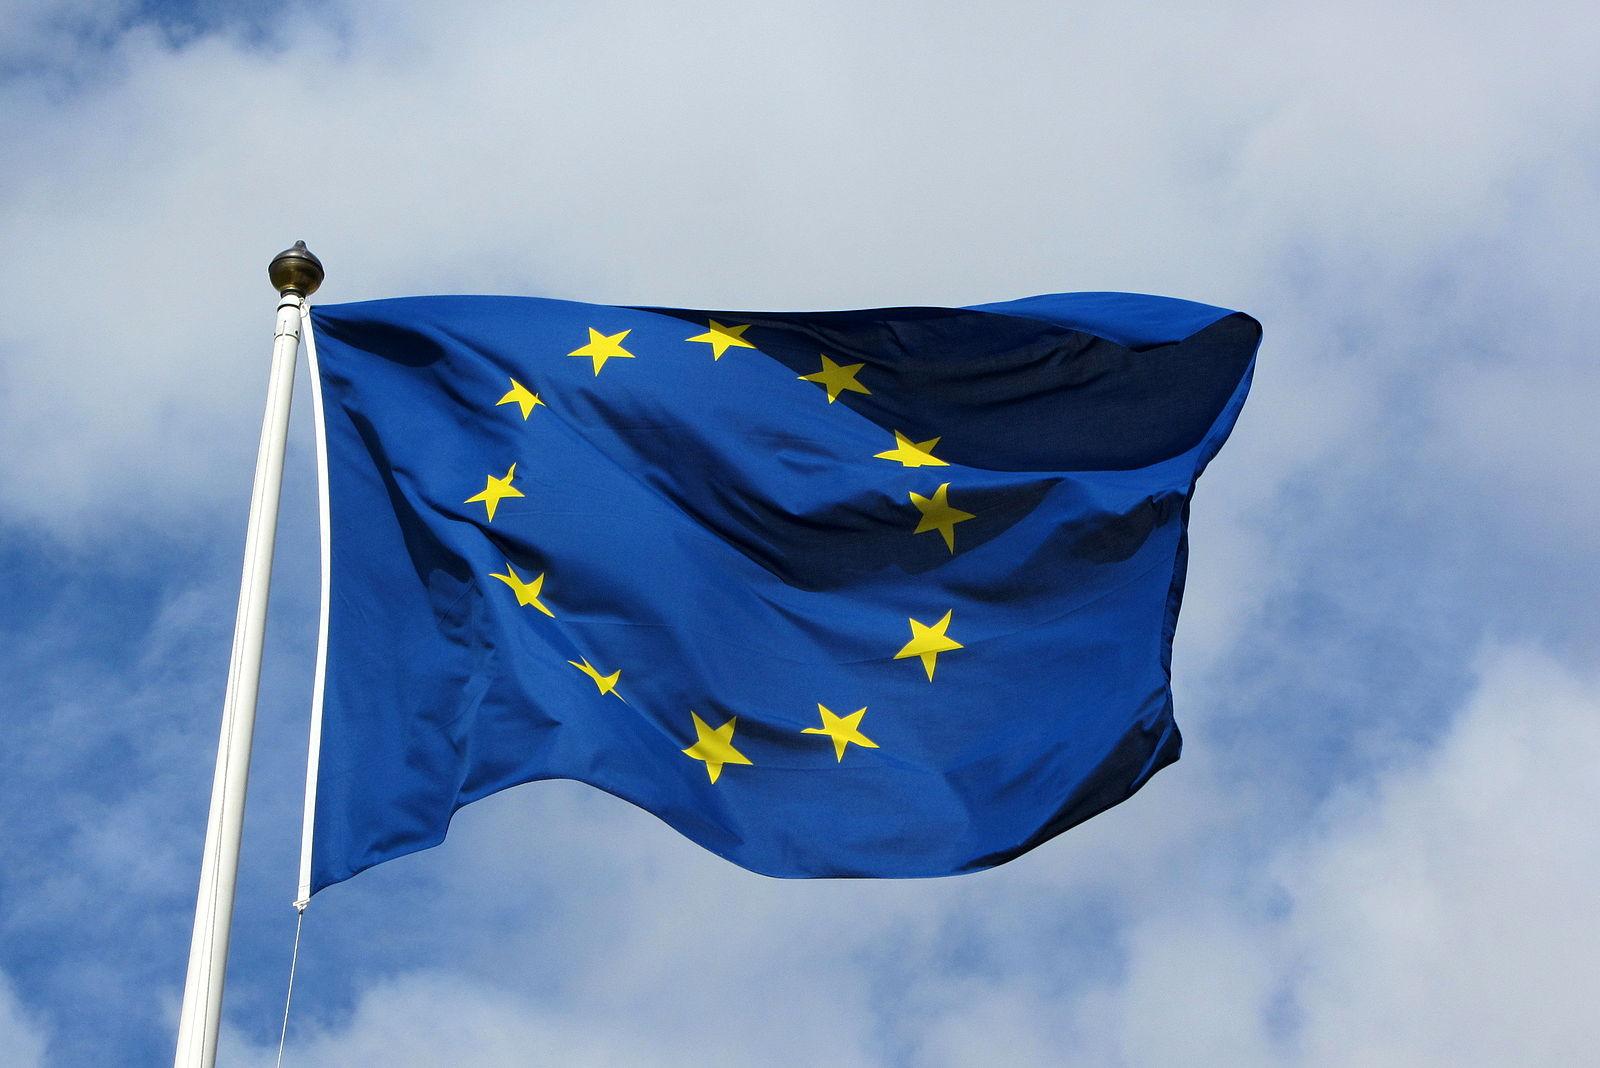 European_flag_in_Karlskrona_2011.jpg